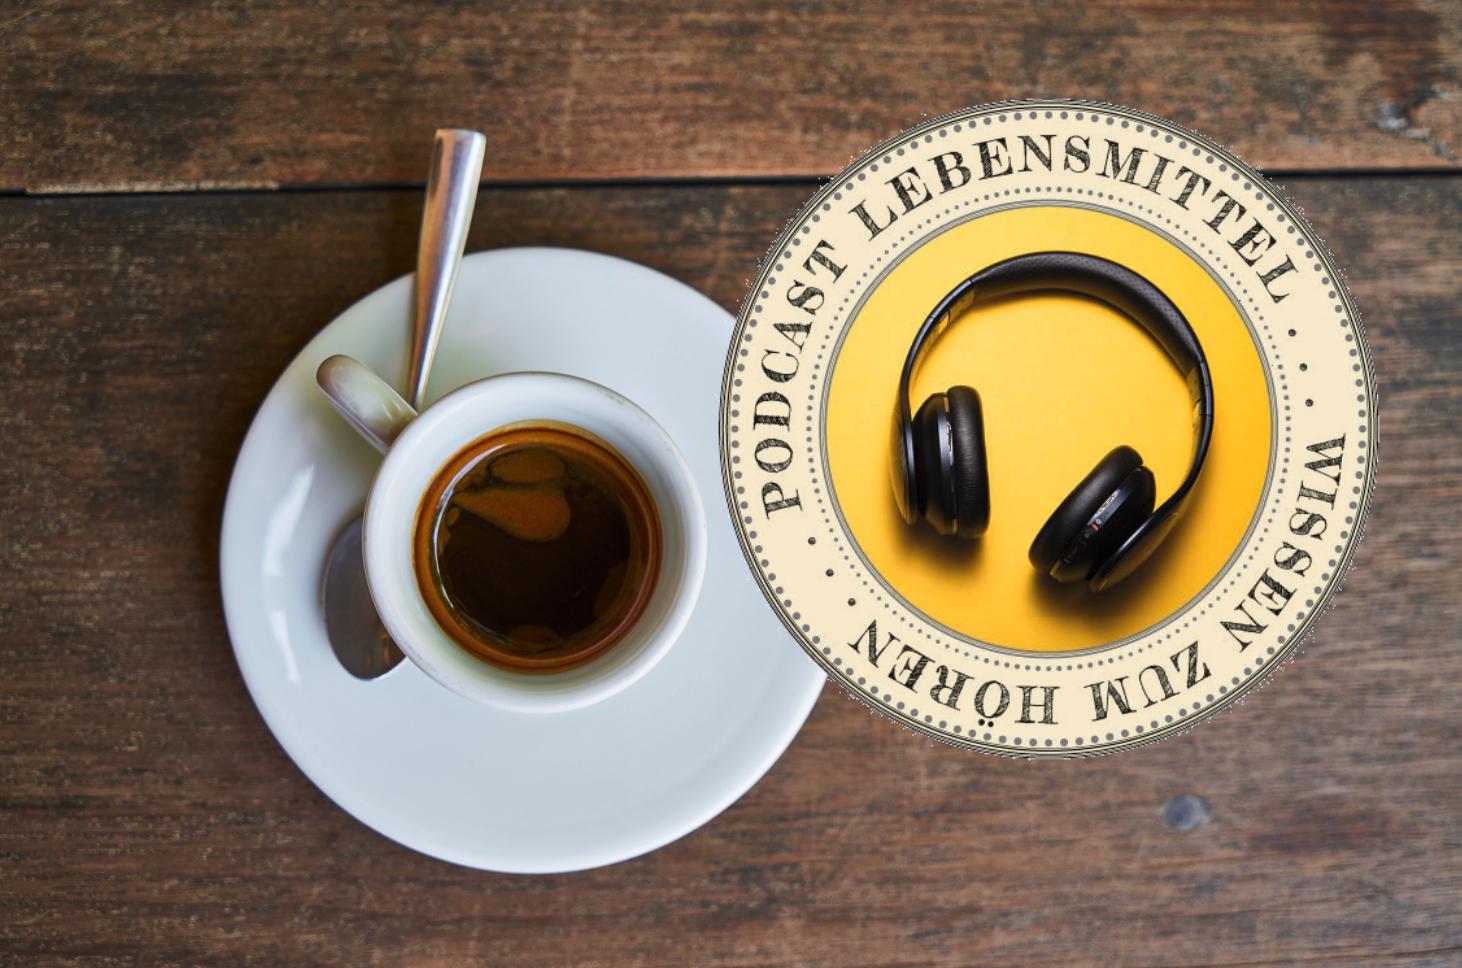 Tasse Espresso mit Poscast-Sujet